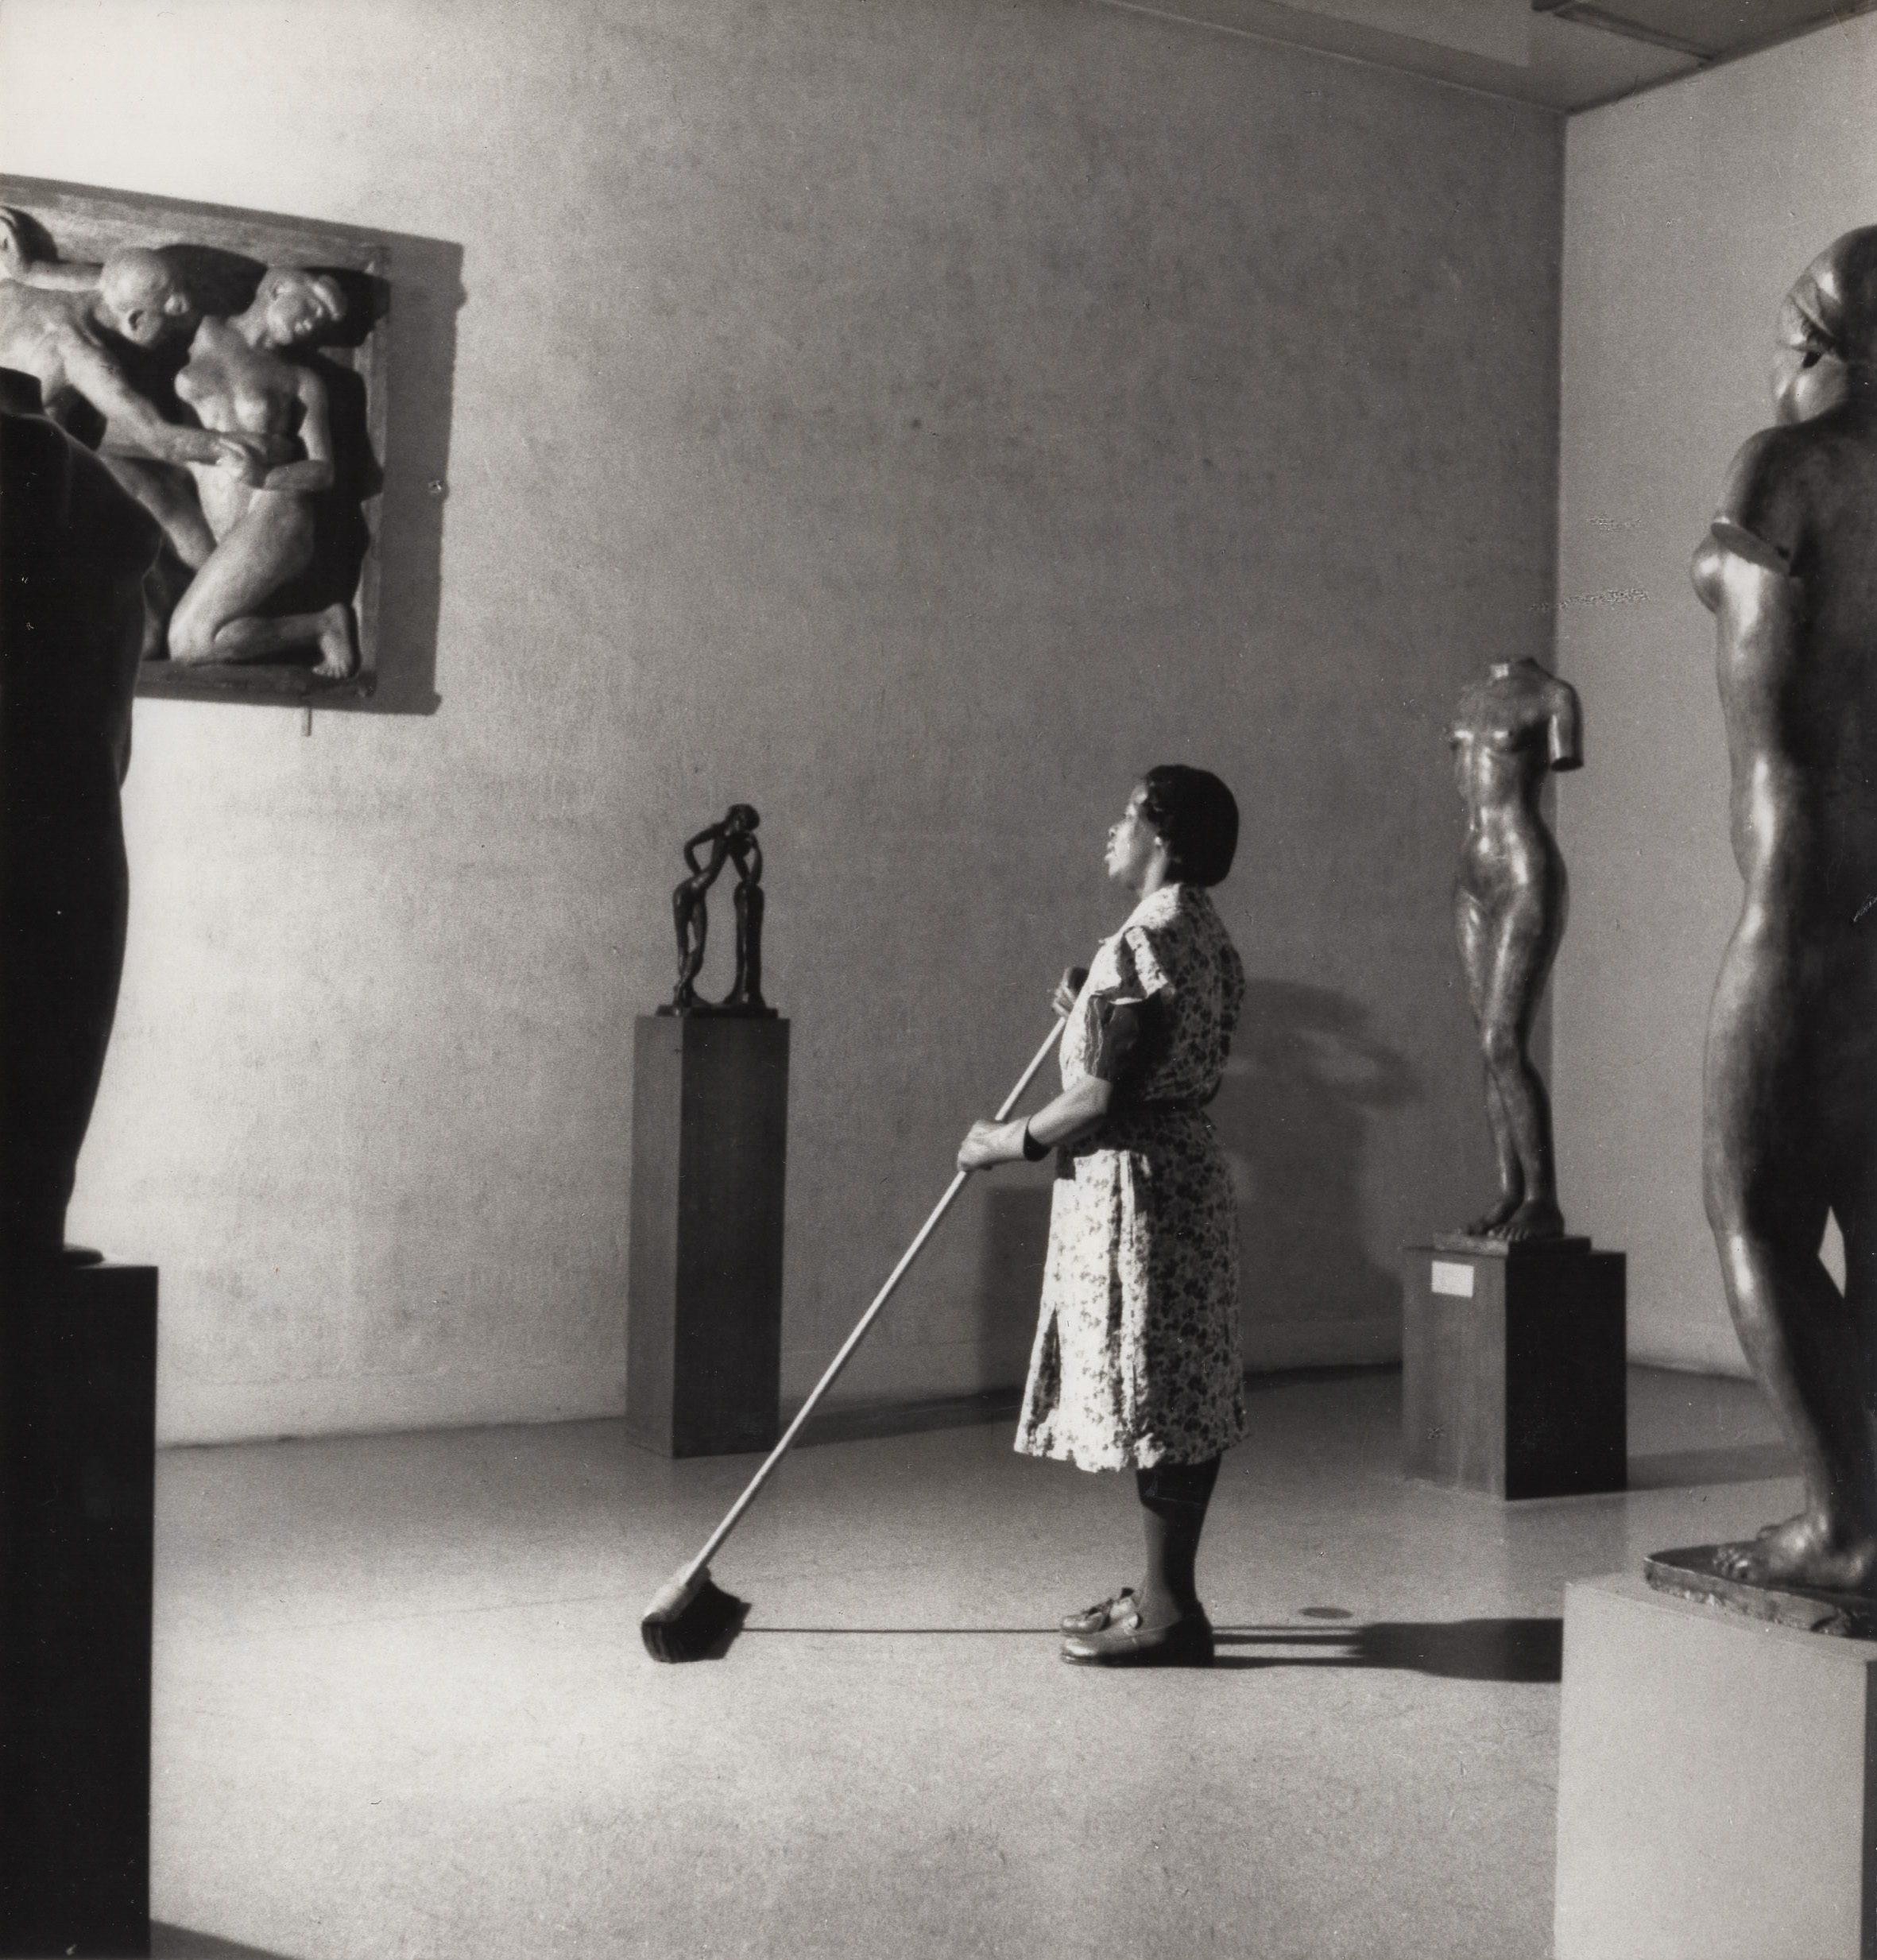 Night in the Museum of Modern Art, New York